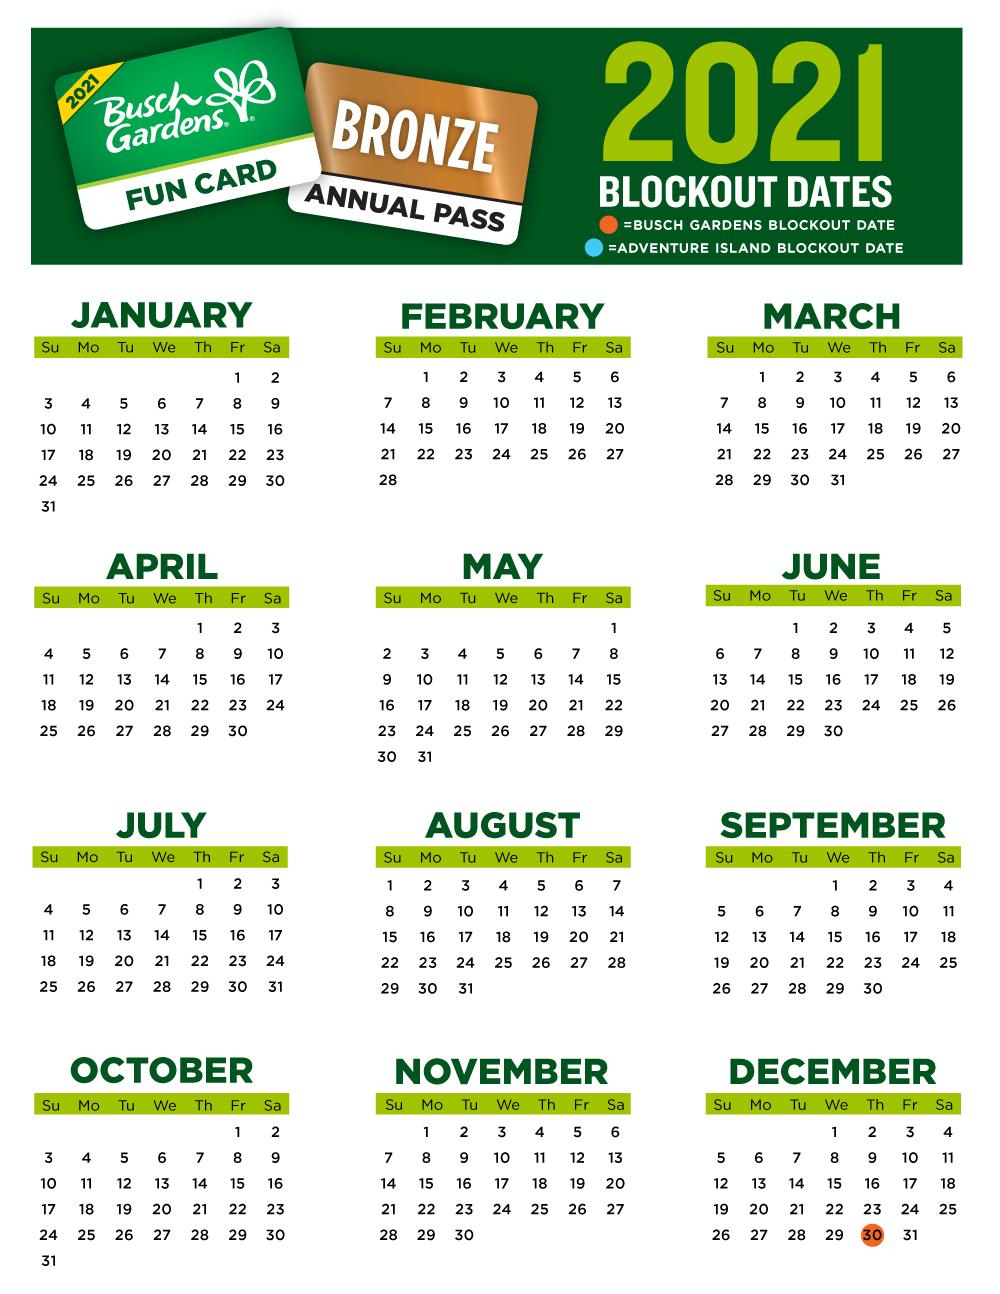 2021 Busch Gardens Tampa Bay Fun Card Blockout Dates